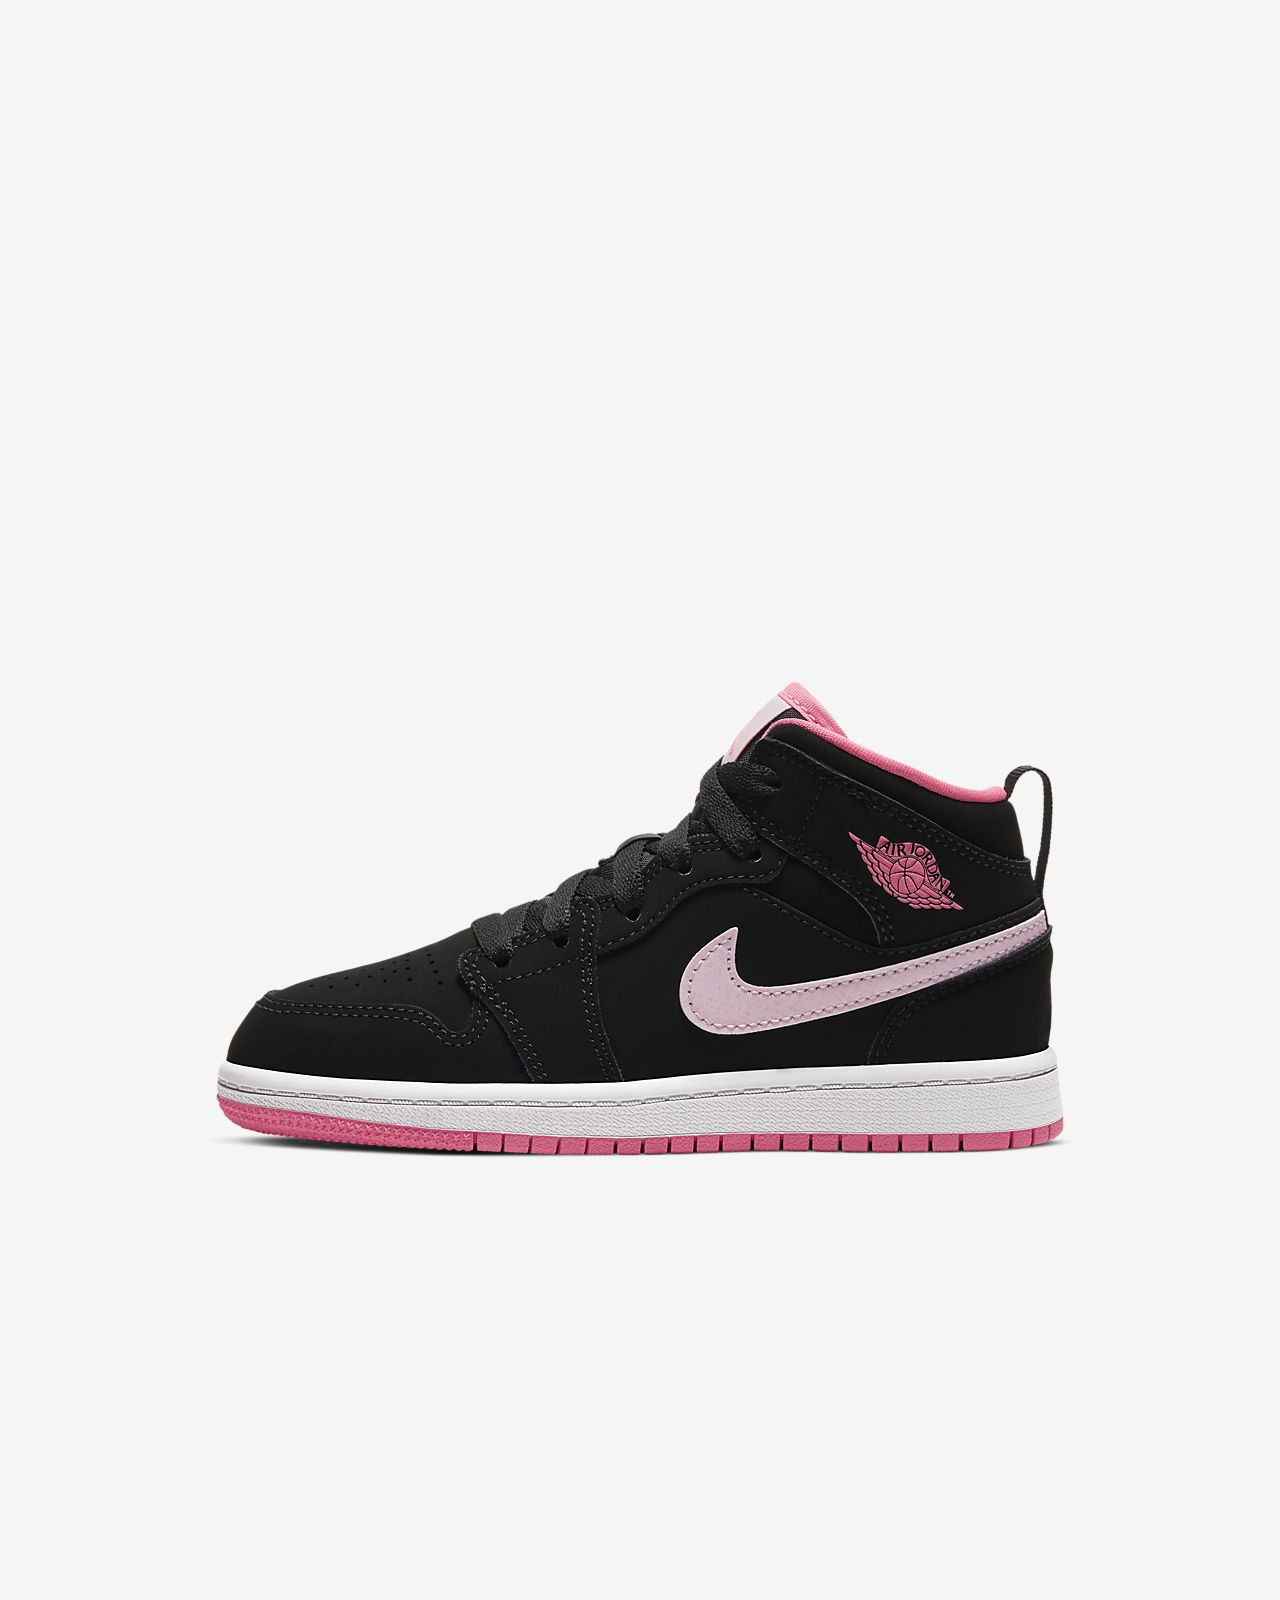 Air Jordan 1 Mid Younger Kids' Shoe